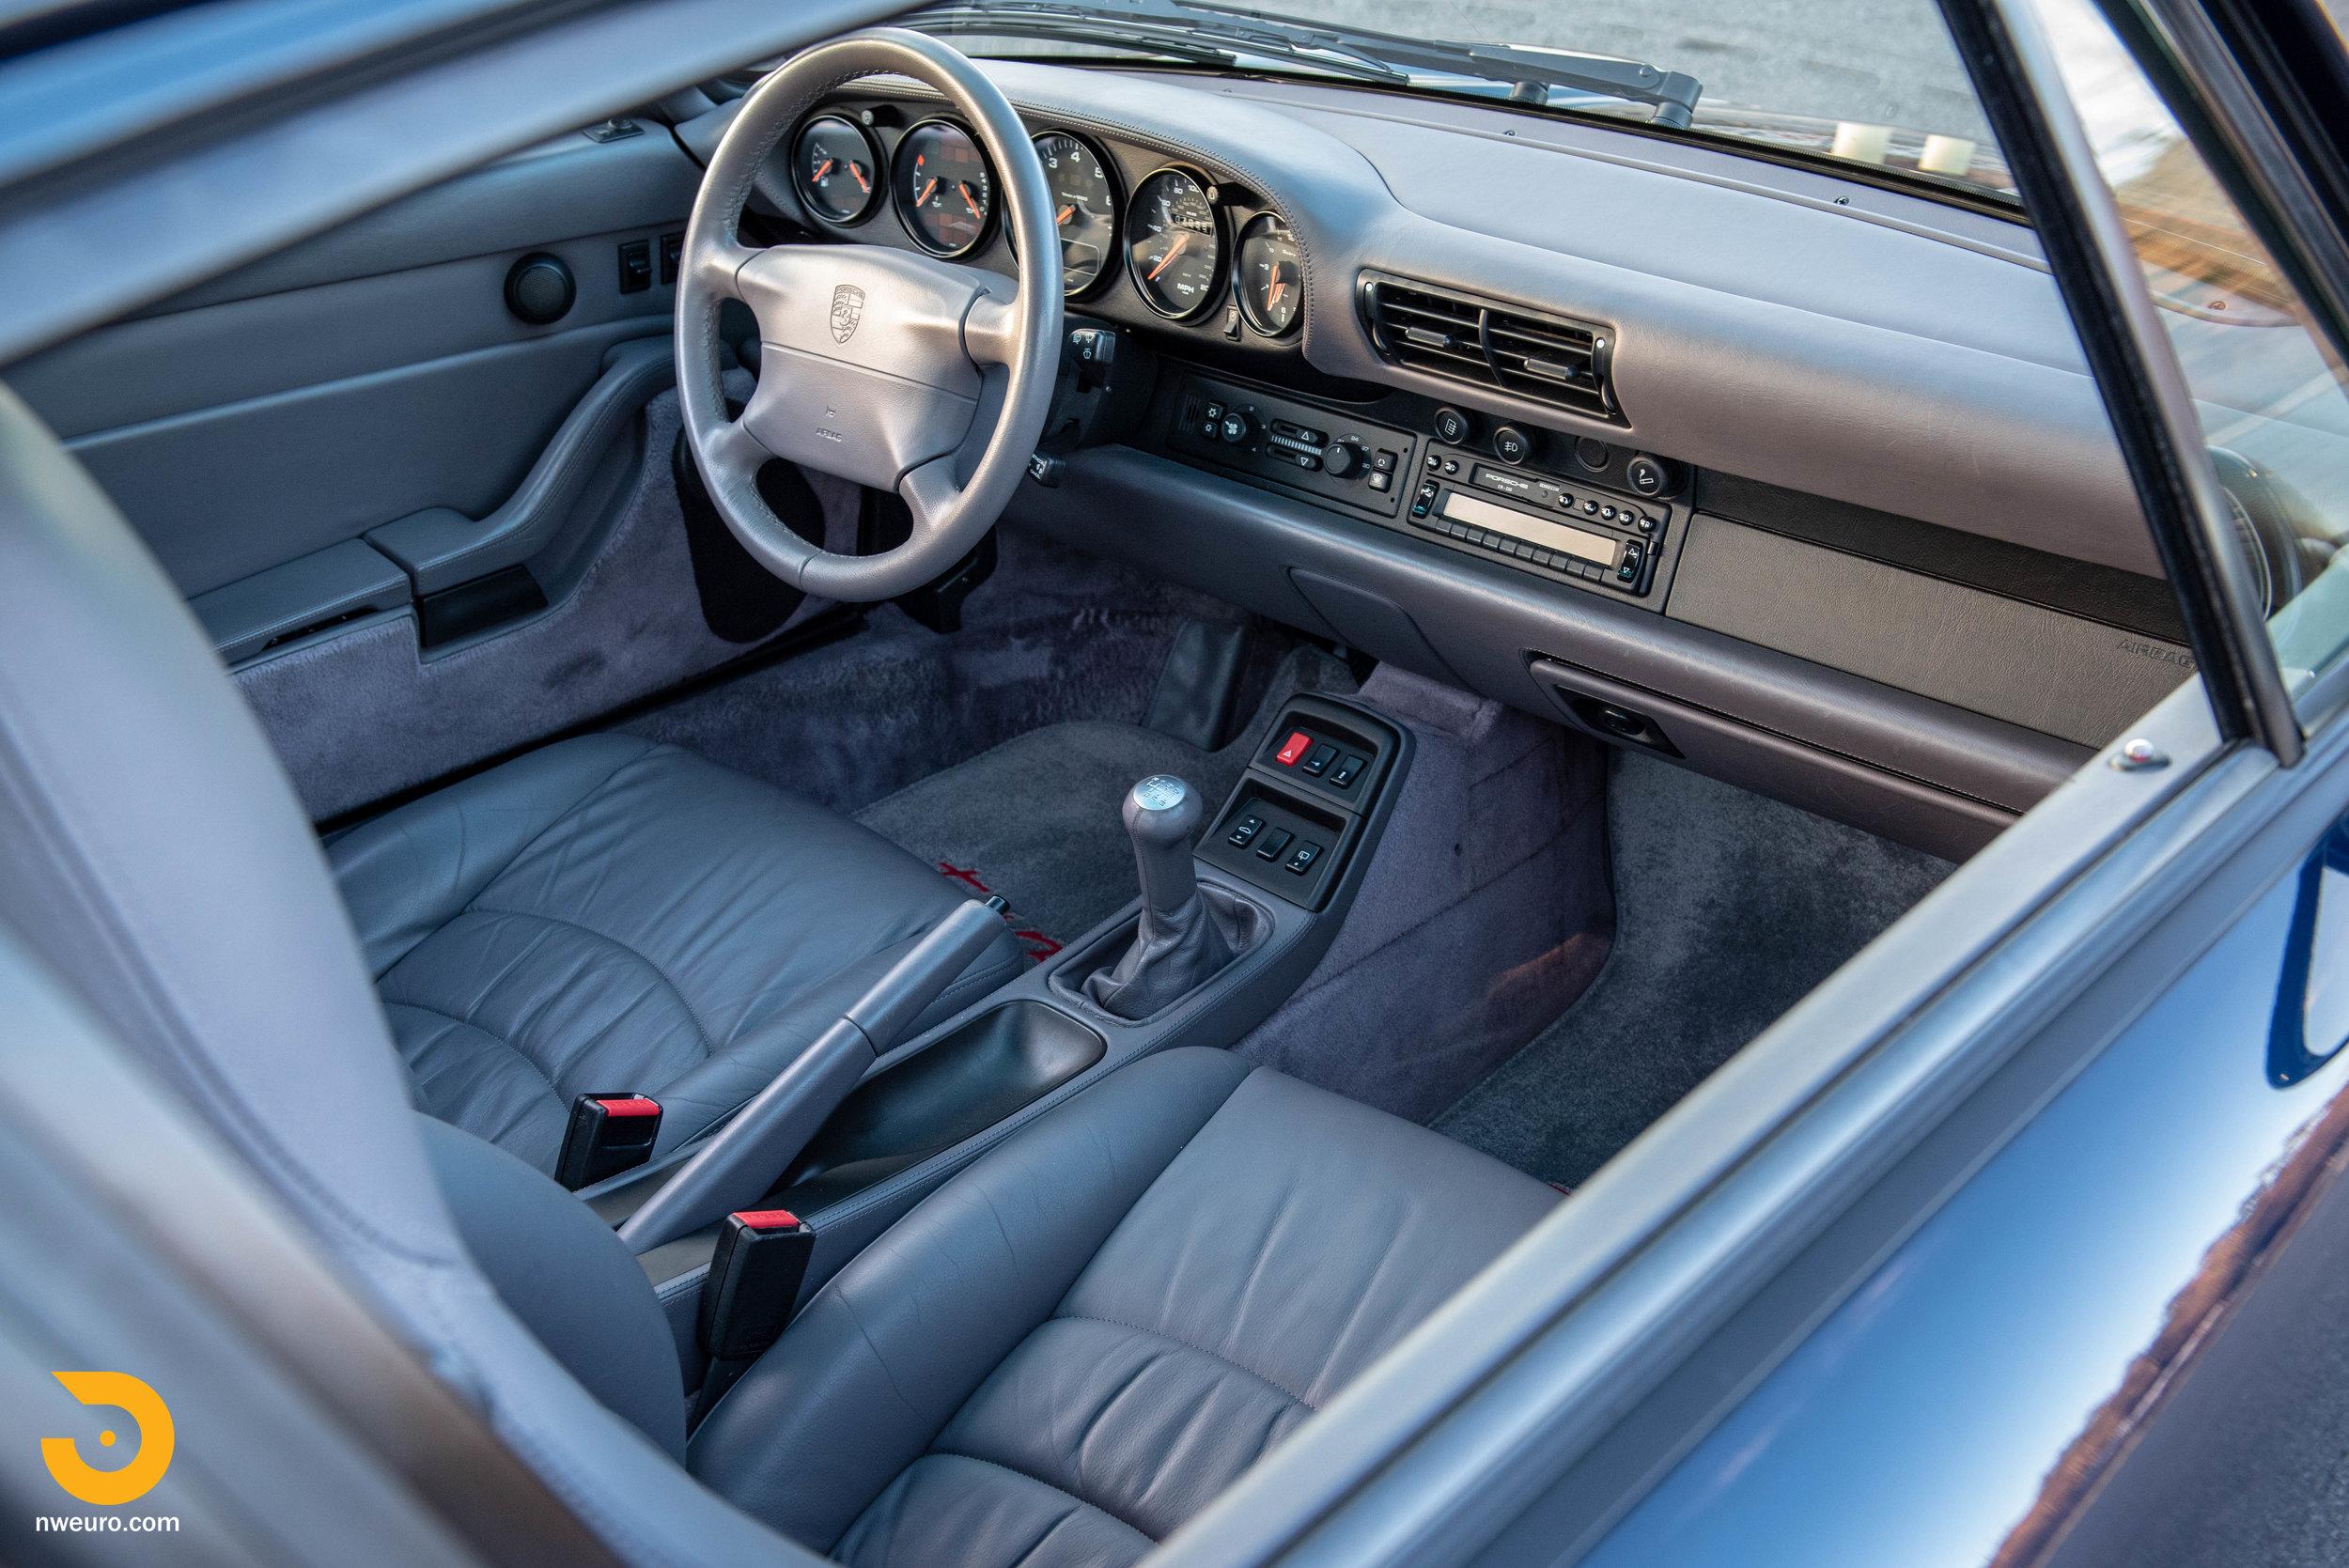 1997 Porsche 993 Turbo Ocean Blue-36.jpg